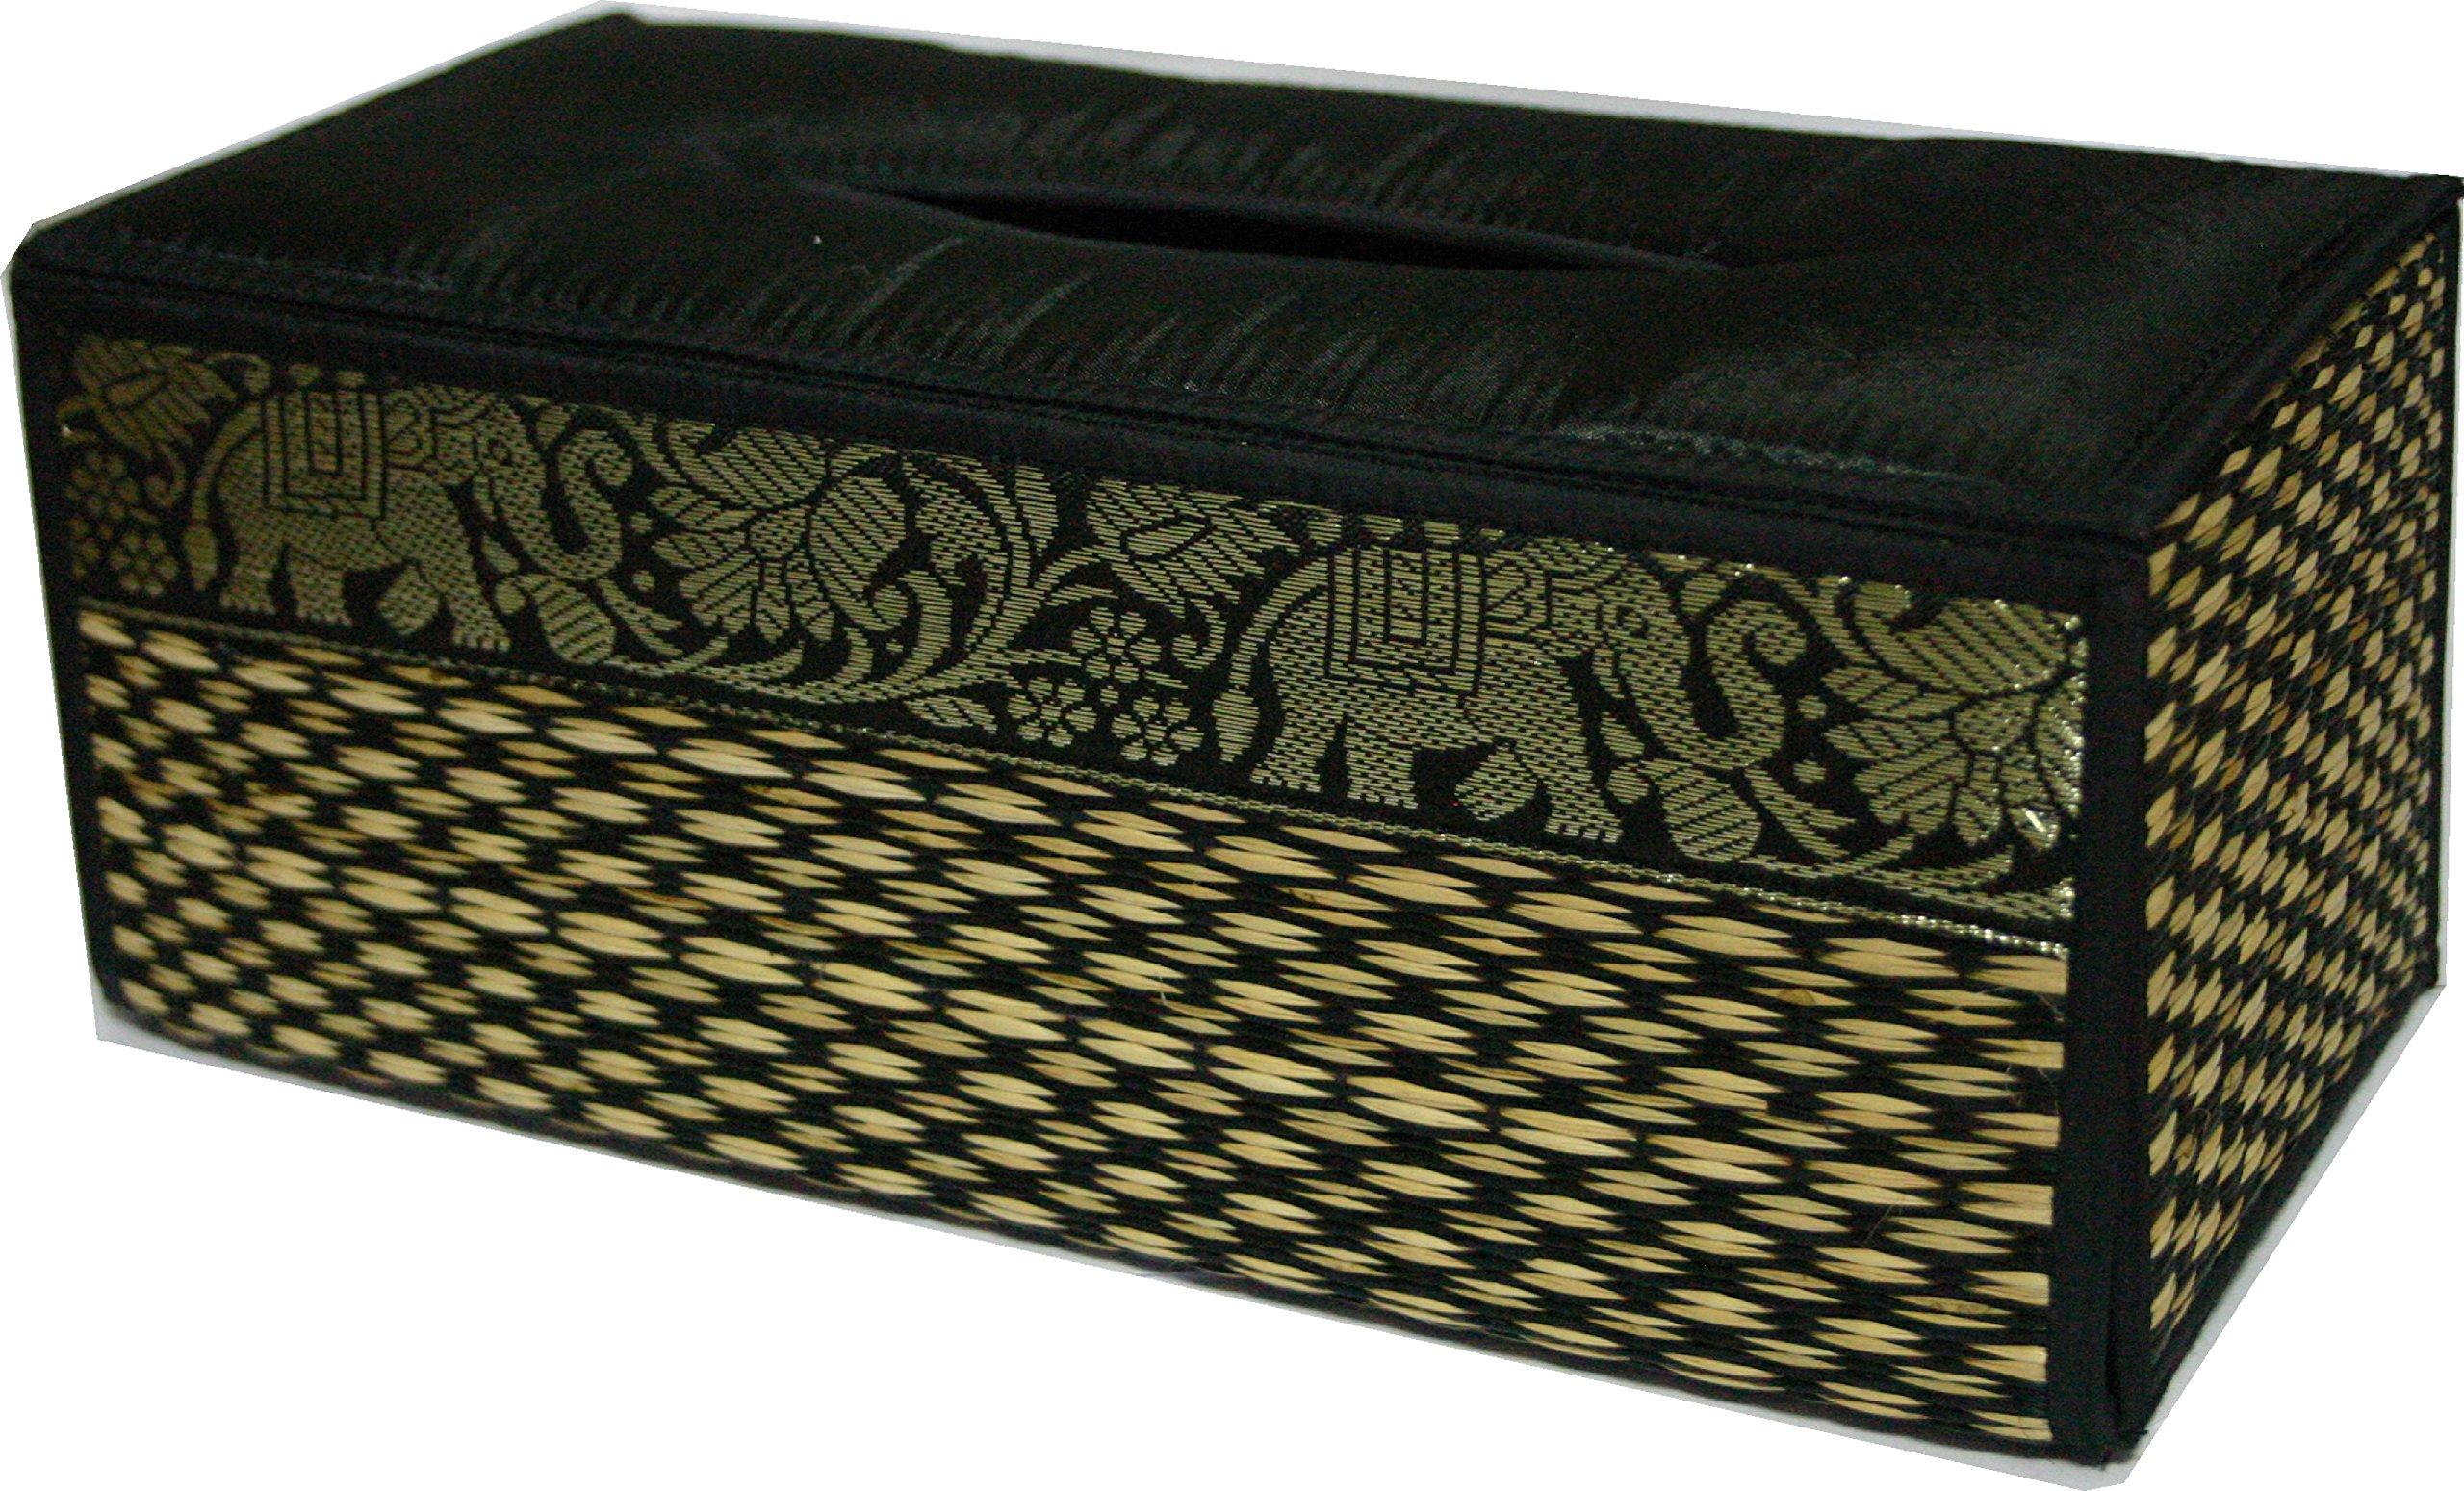 TOPMOST N-9010, Handmade Thai Woven Straw Reed Rectangular Tissue Box Cover with Silk Elephant Design 5x3.7x10.2 Inch